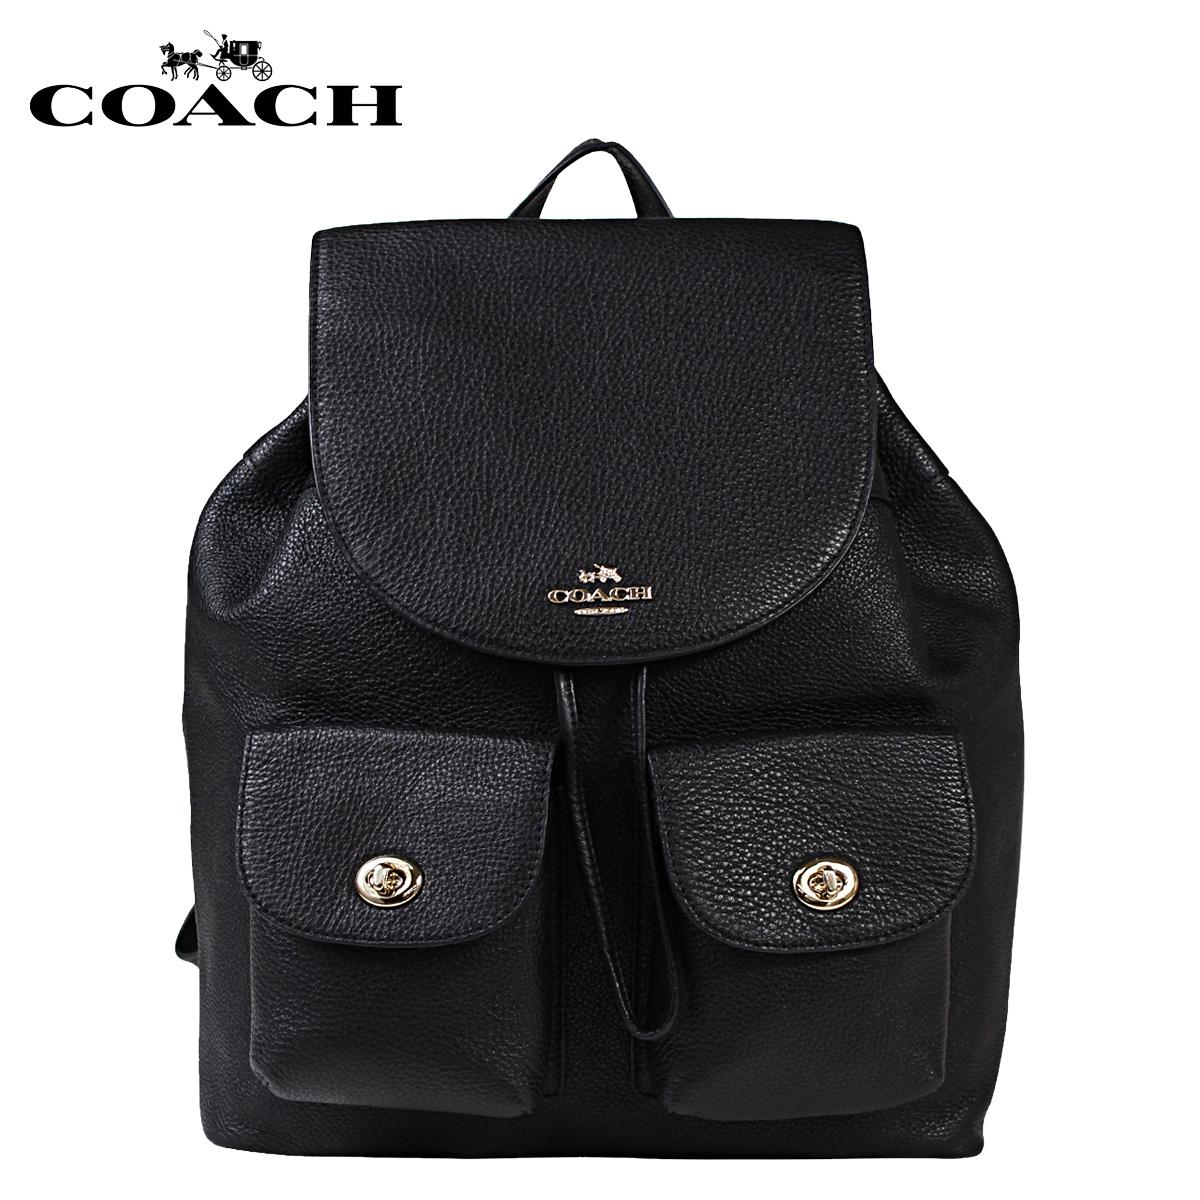 [SOLD OUT]COACH教練包帆布背包背包F37410黑色女士]